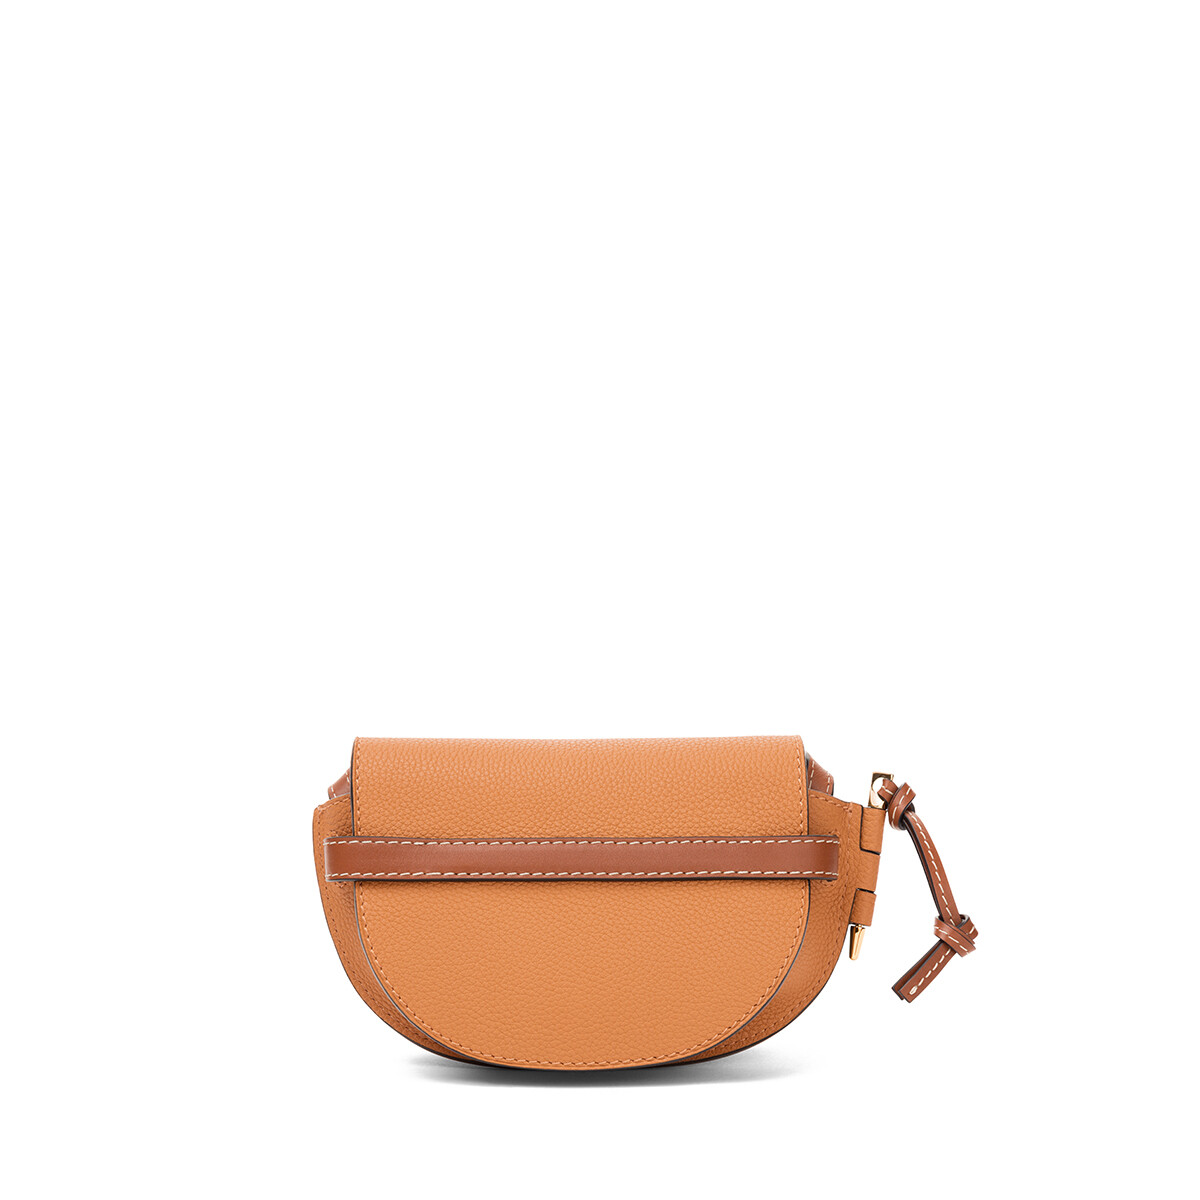 LOEWE Gate Mini Bag Light Caramel/Pecan front